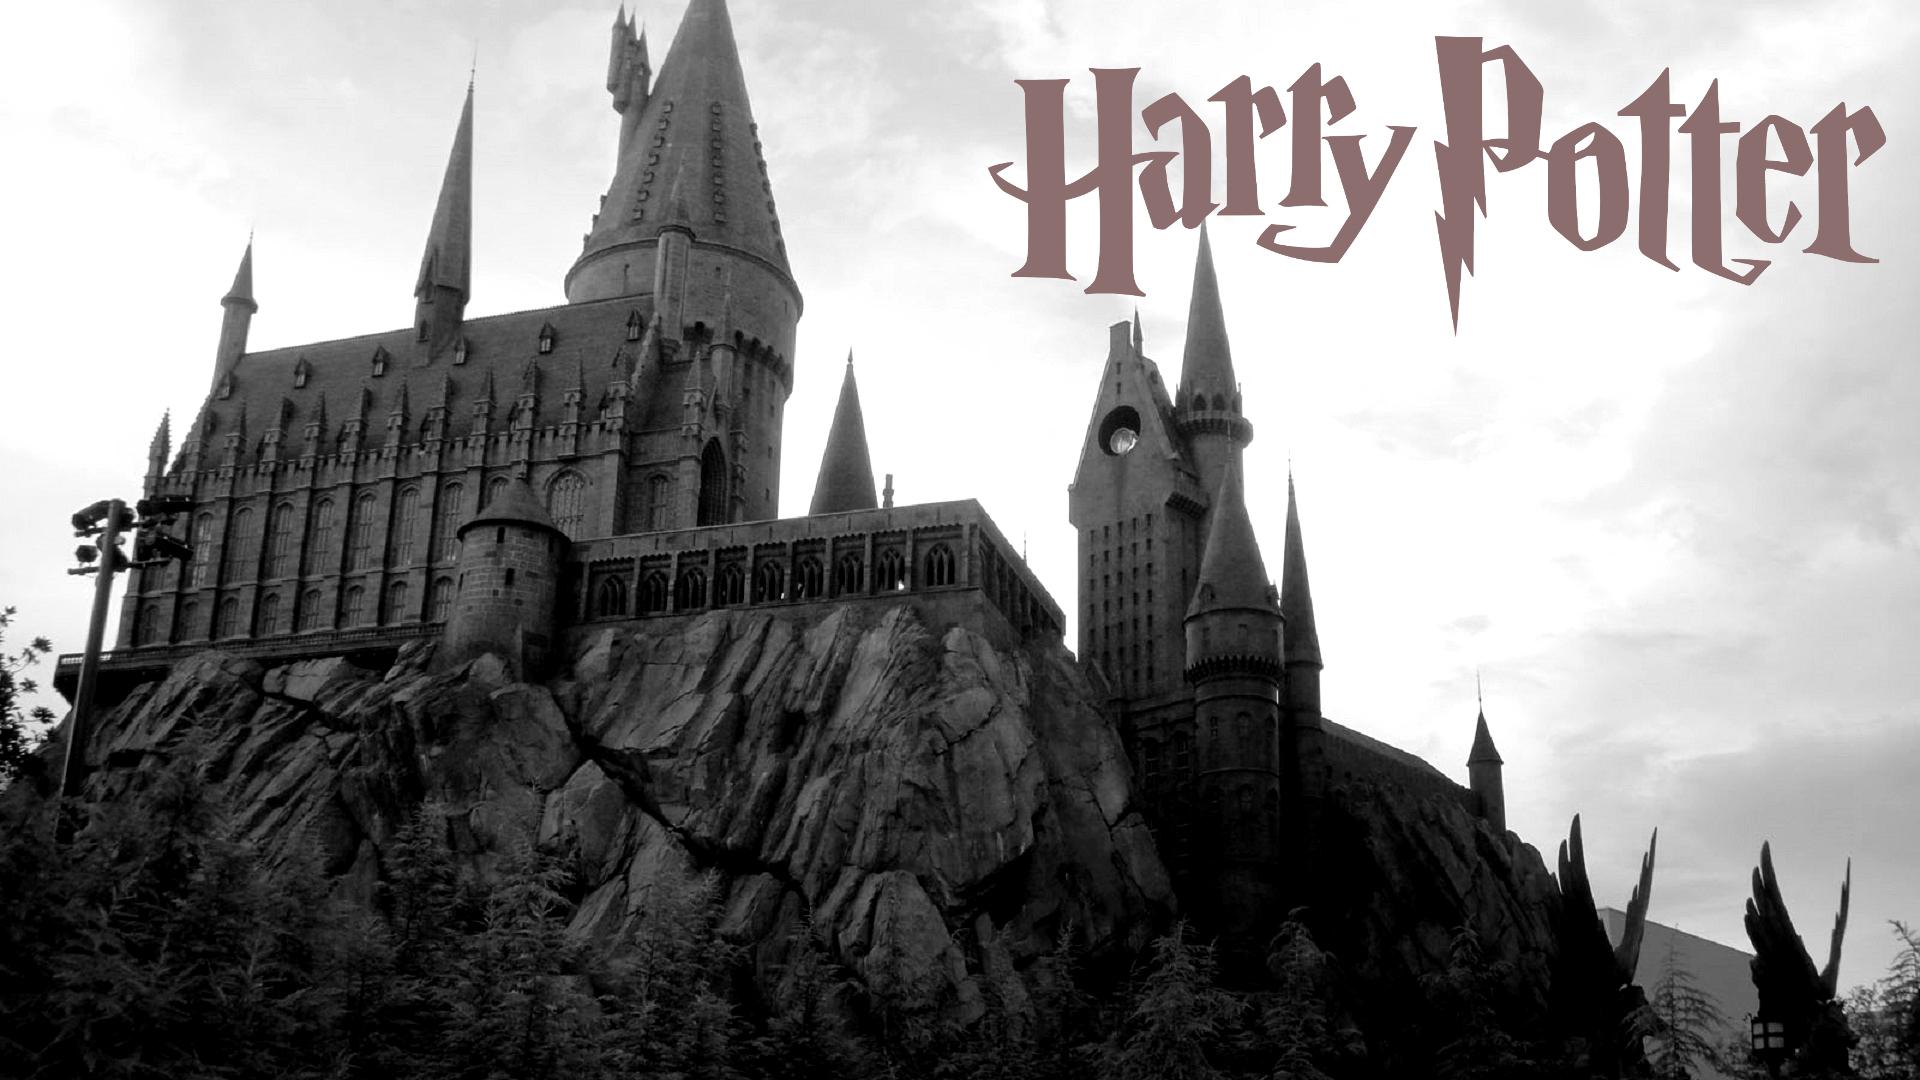 Beautiful Wallpaper Harry Potter Android - Harry-Potter-Desktop-Backgrounds-016  2018_48259.jpg